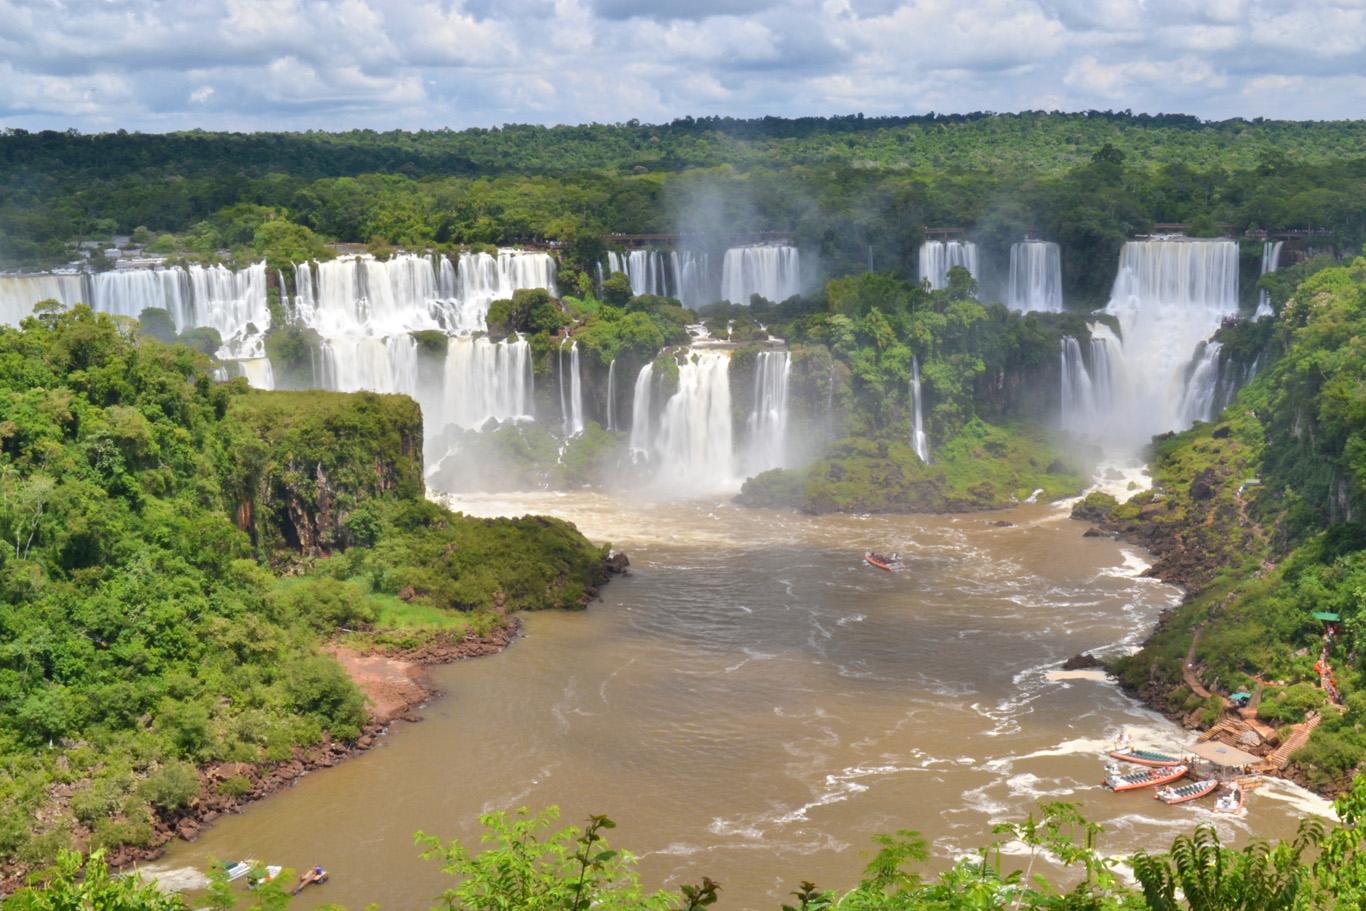 Iguaçu Falls - boats visible on the right